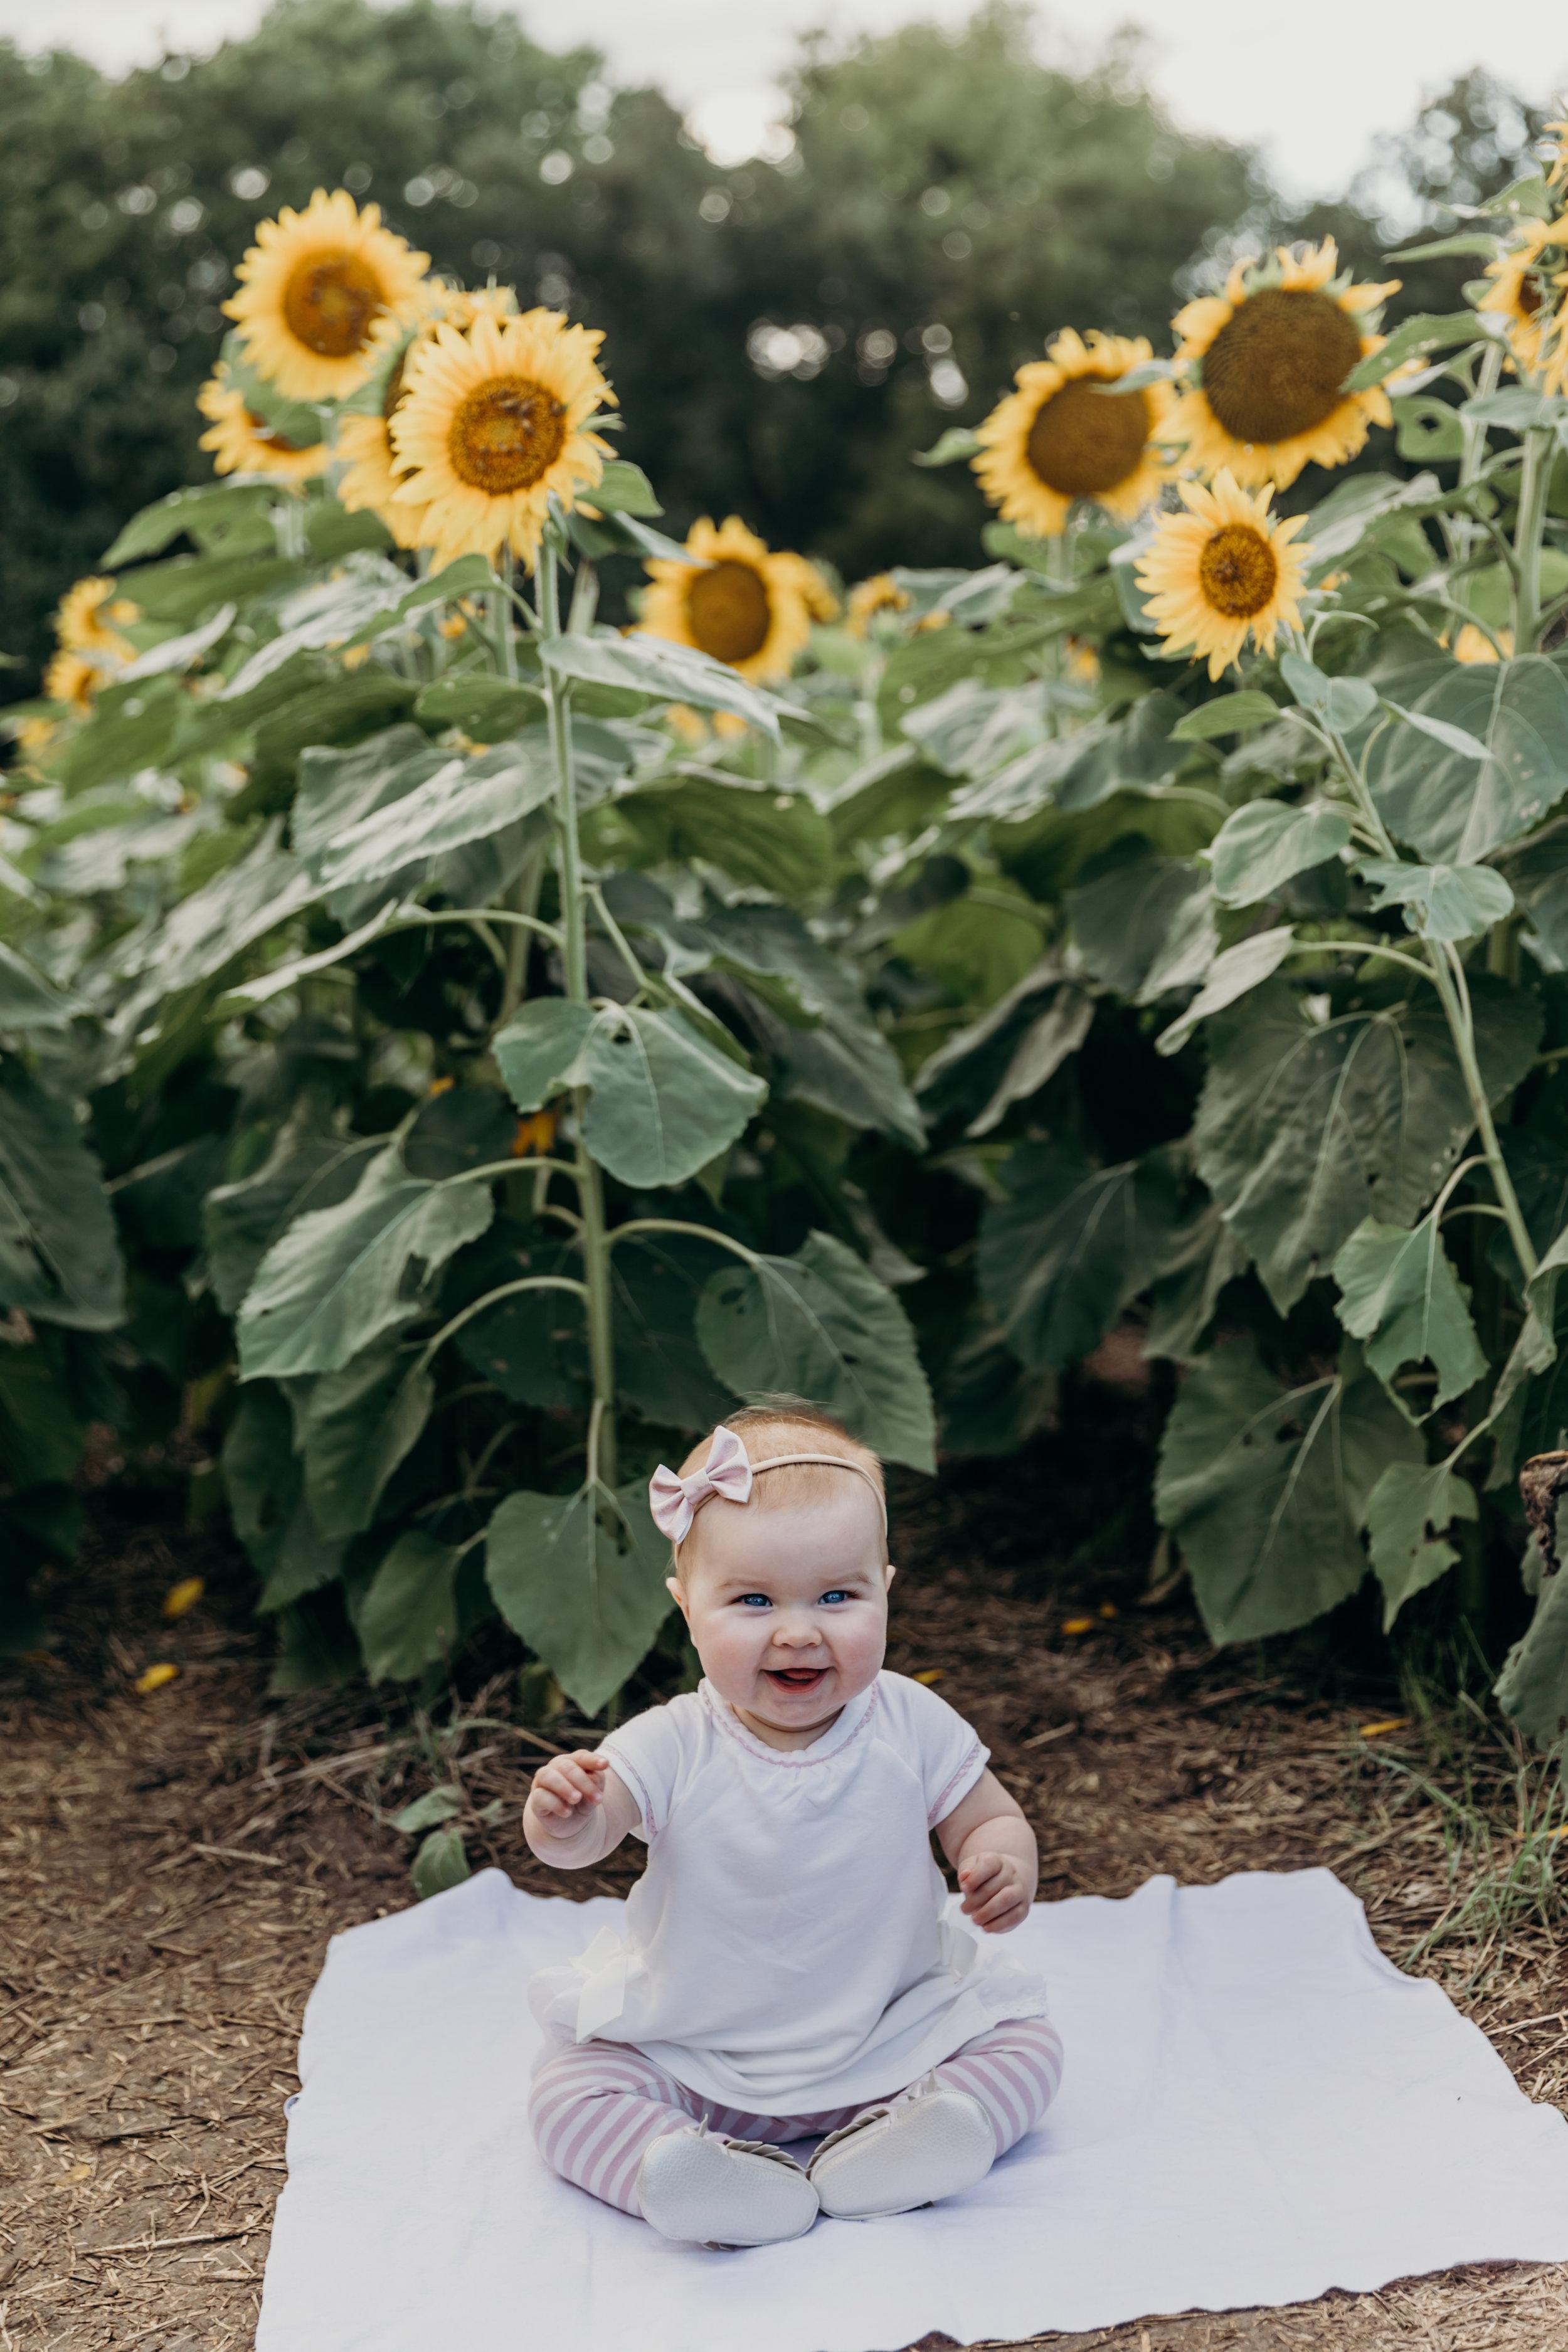 Cumberford Sunflower Mini Session-14.jpg